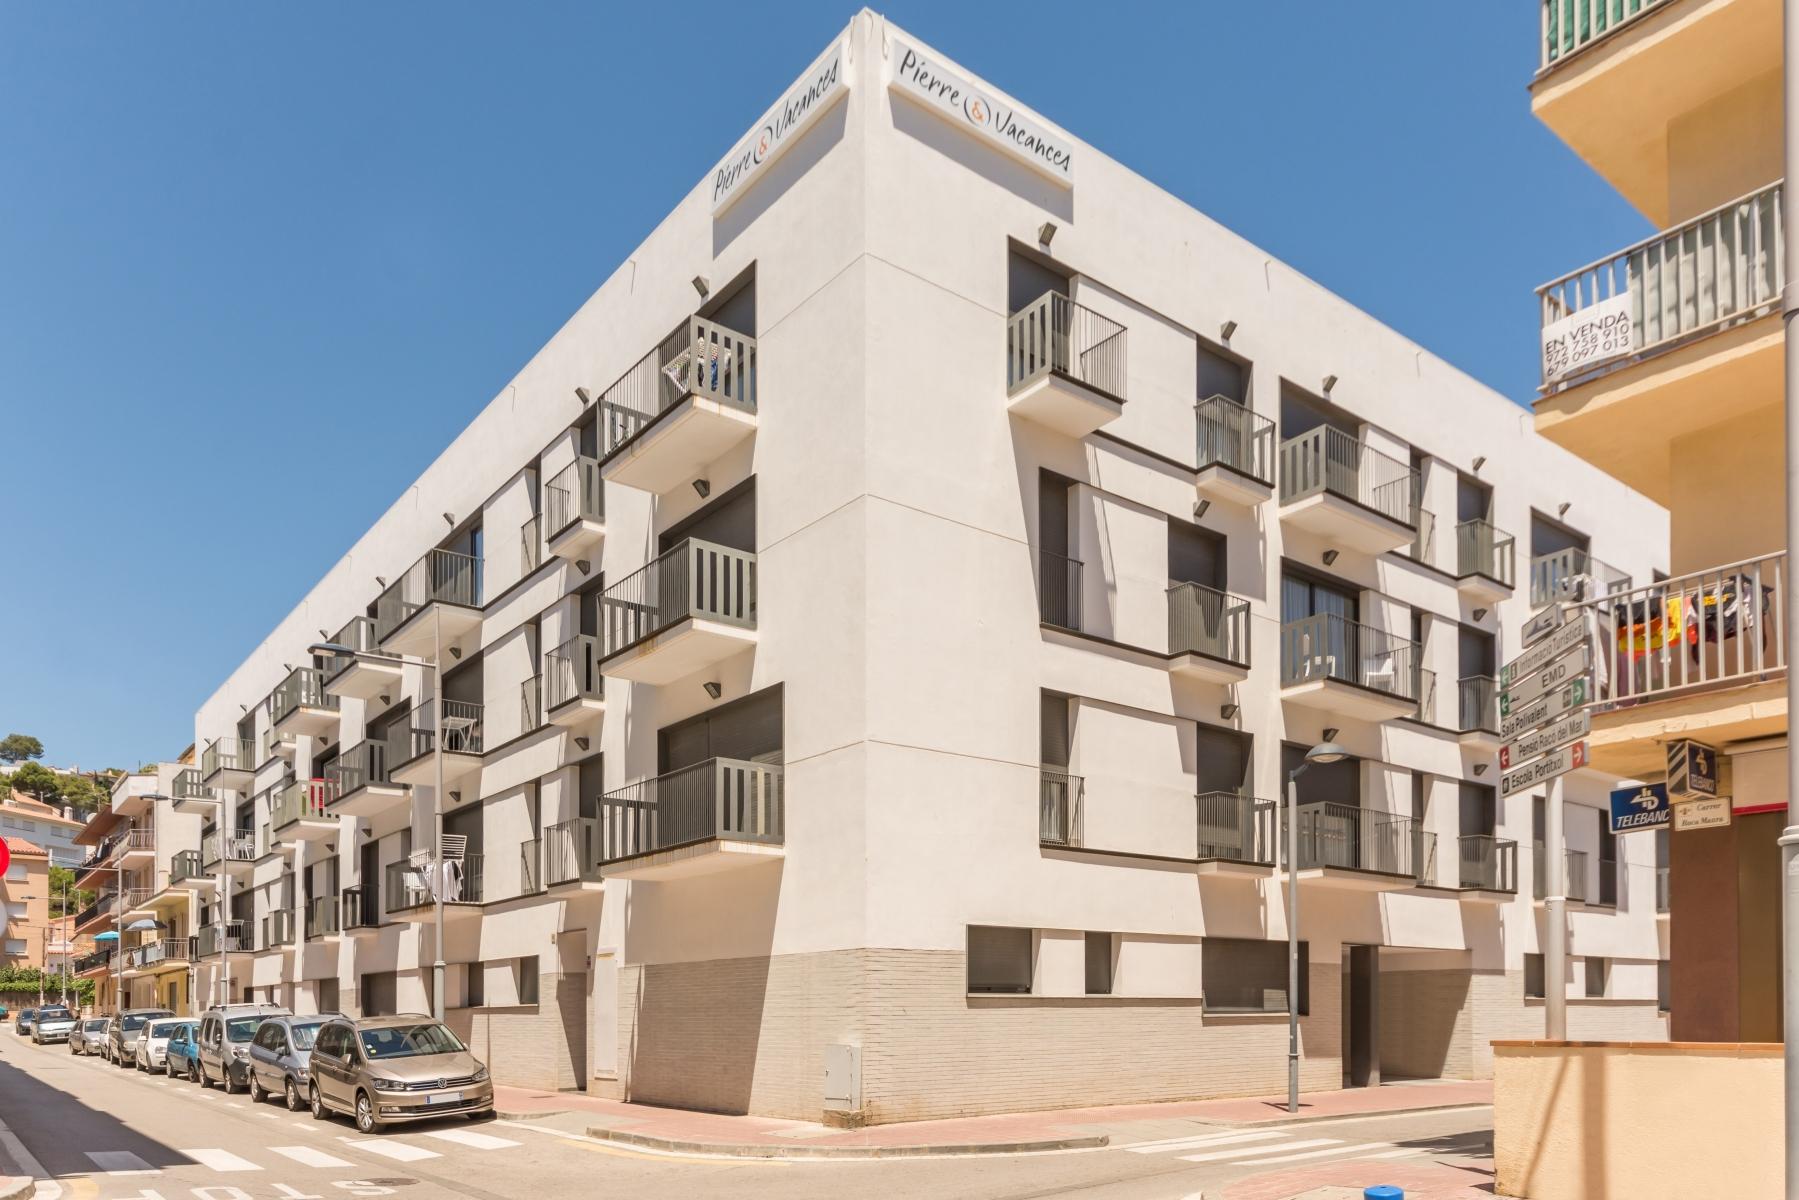 Korting vakantiepark Girona 🏕️Pierre & Vacances Résidence Estartit Costa